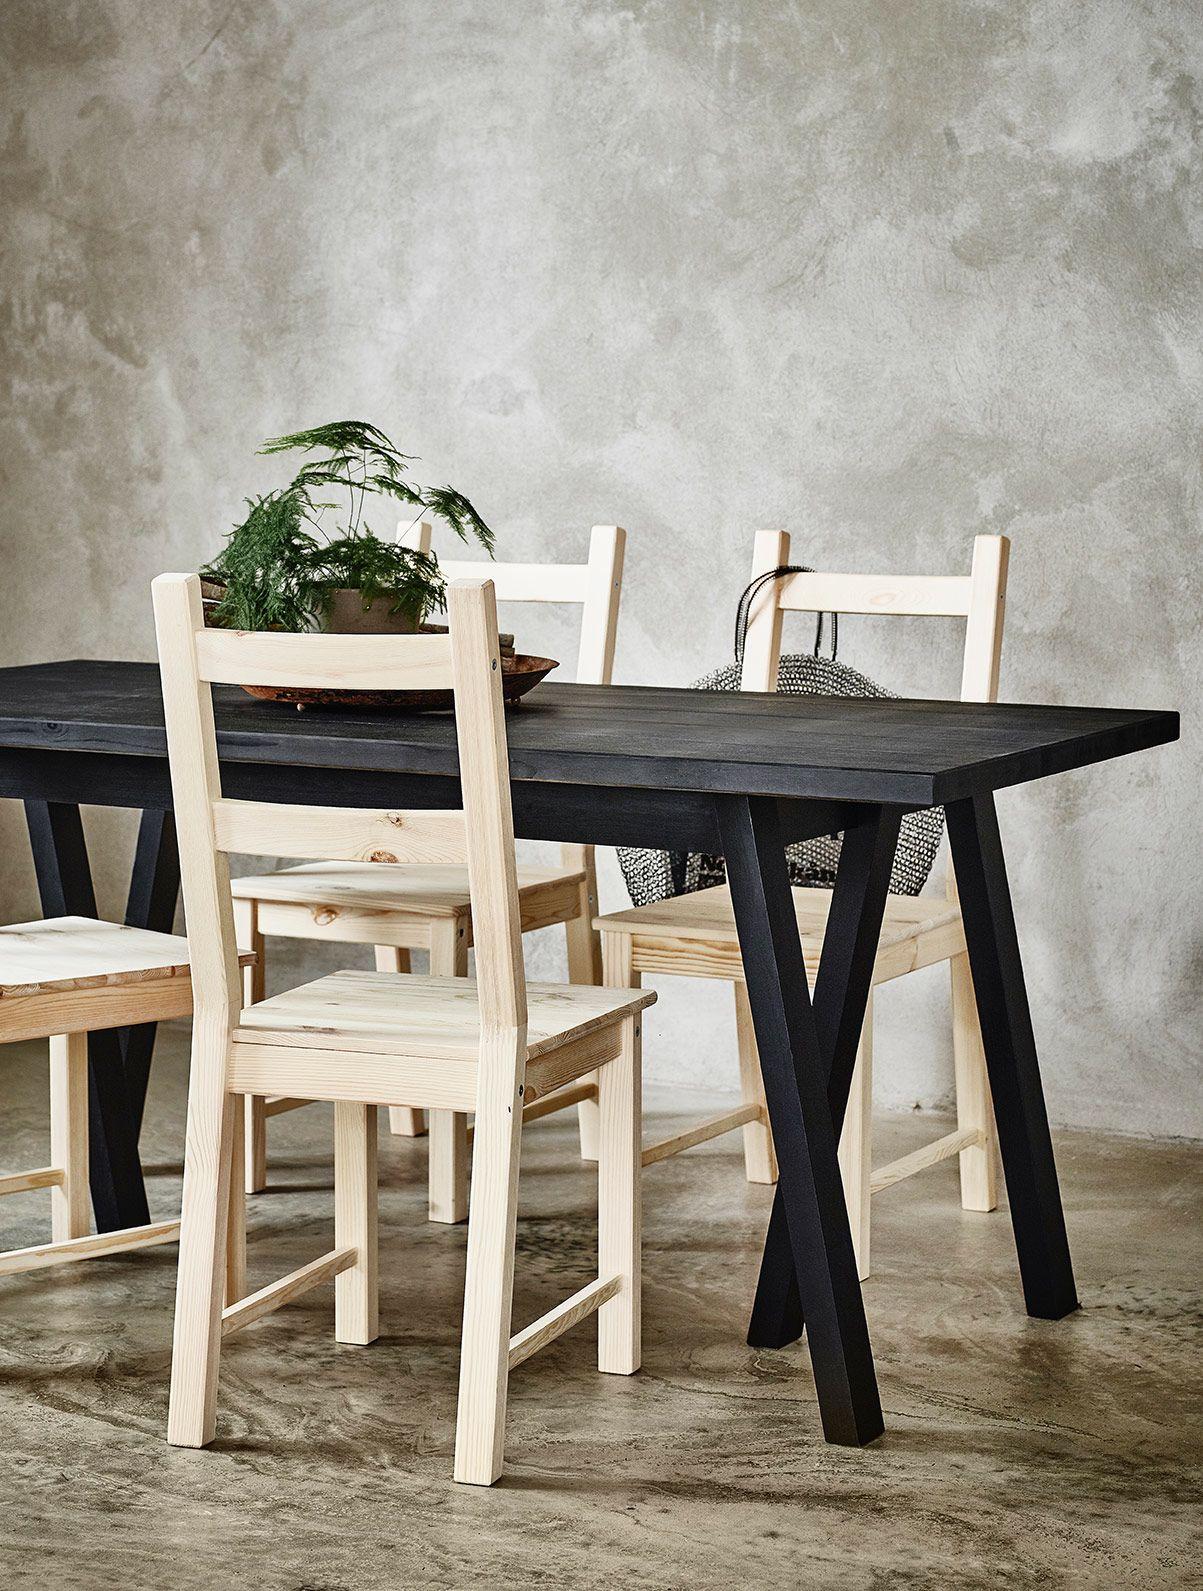 Grebbestad Ryggestad Table Diy Keukentafel Eettafel Tafel Ikea